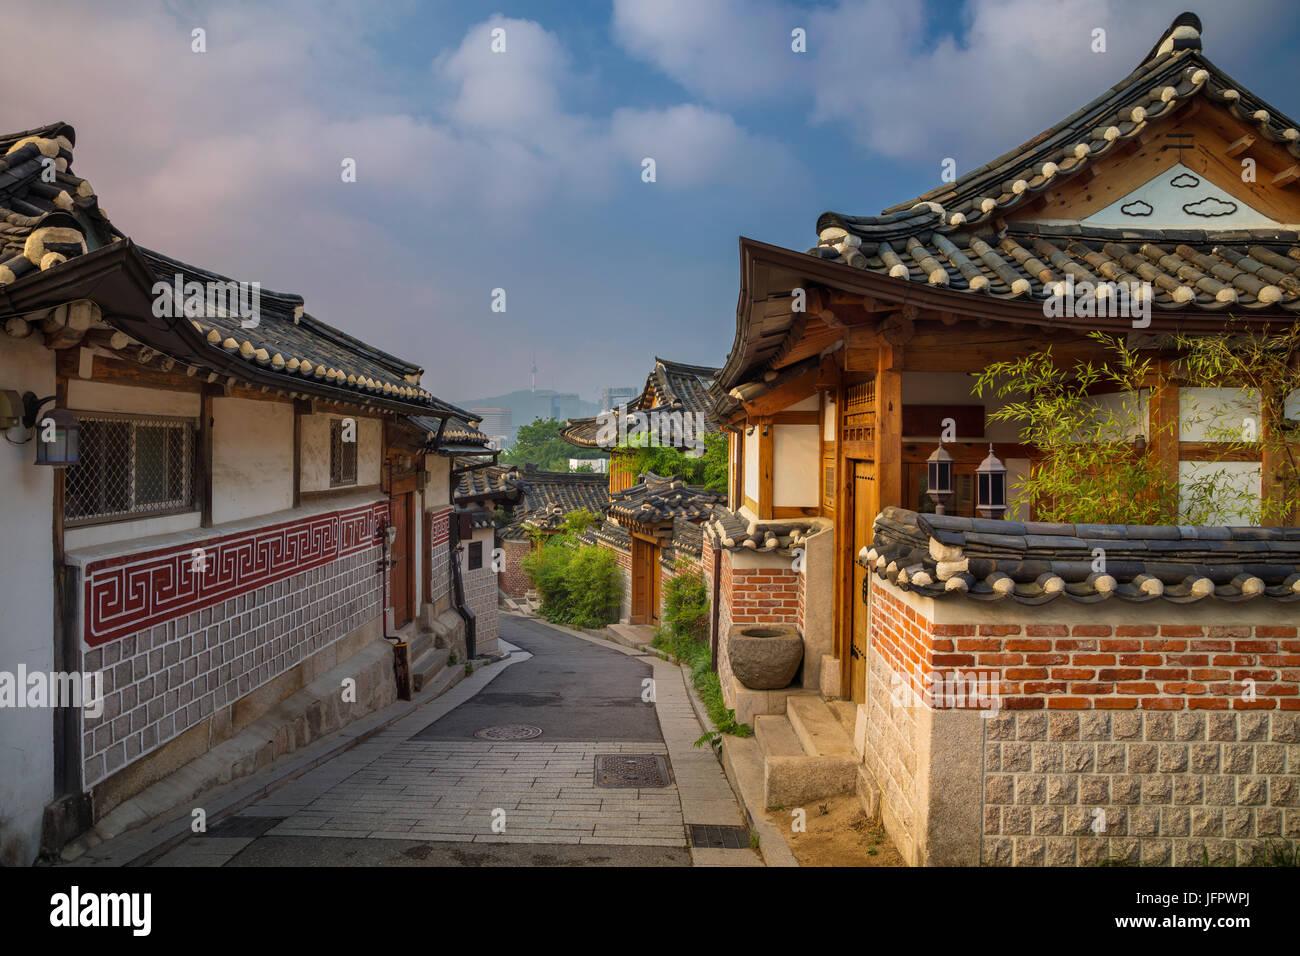 how to get to korean seoul village